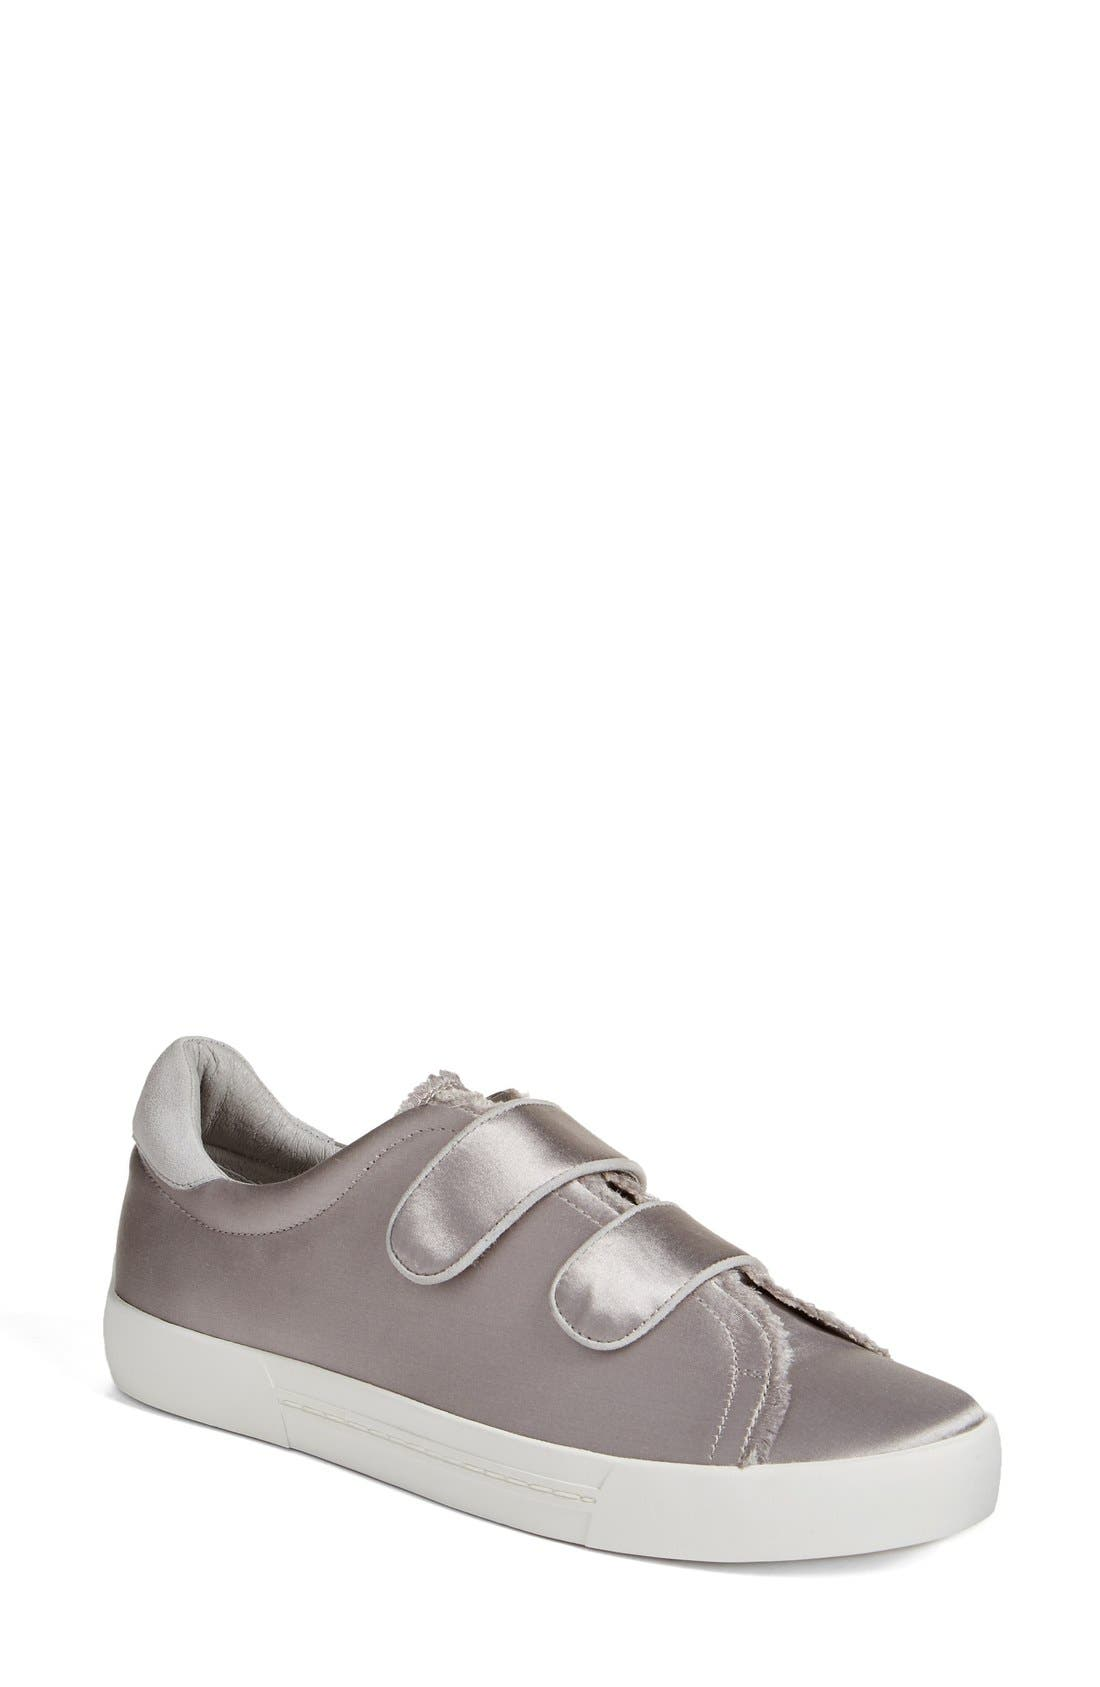 JOIE 'Diata' Low Top Sneaker